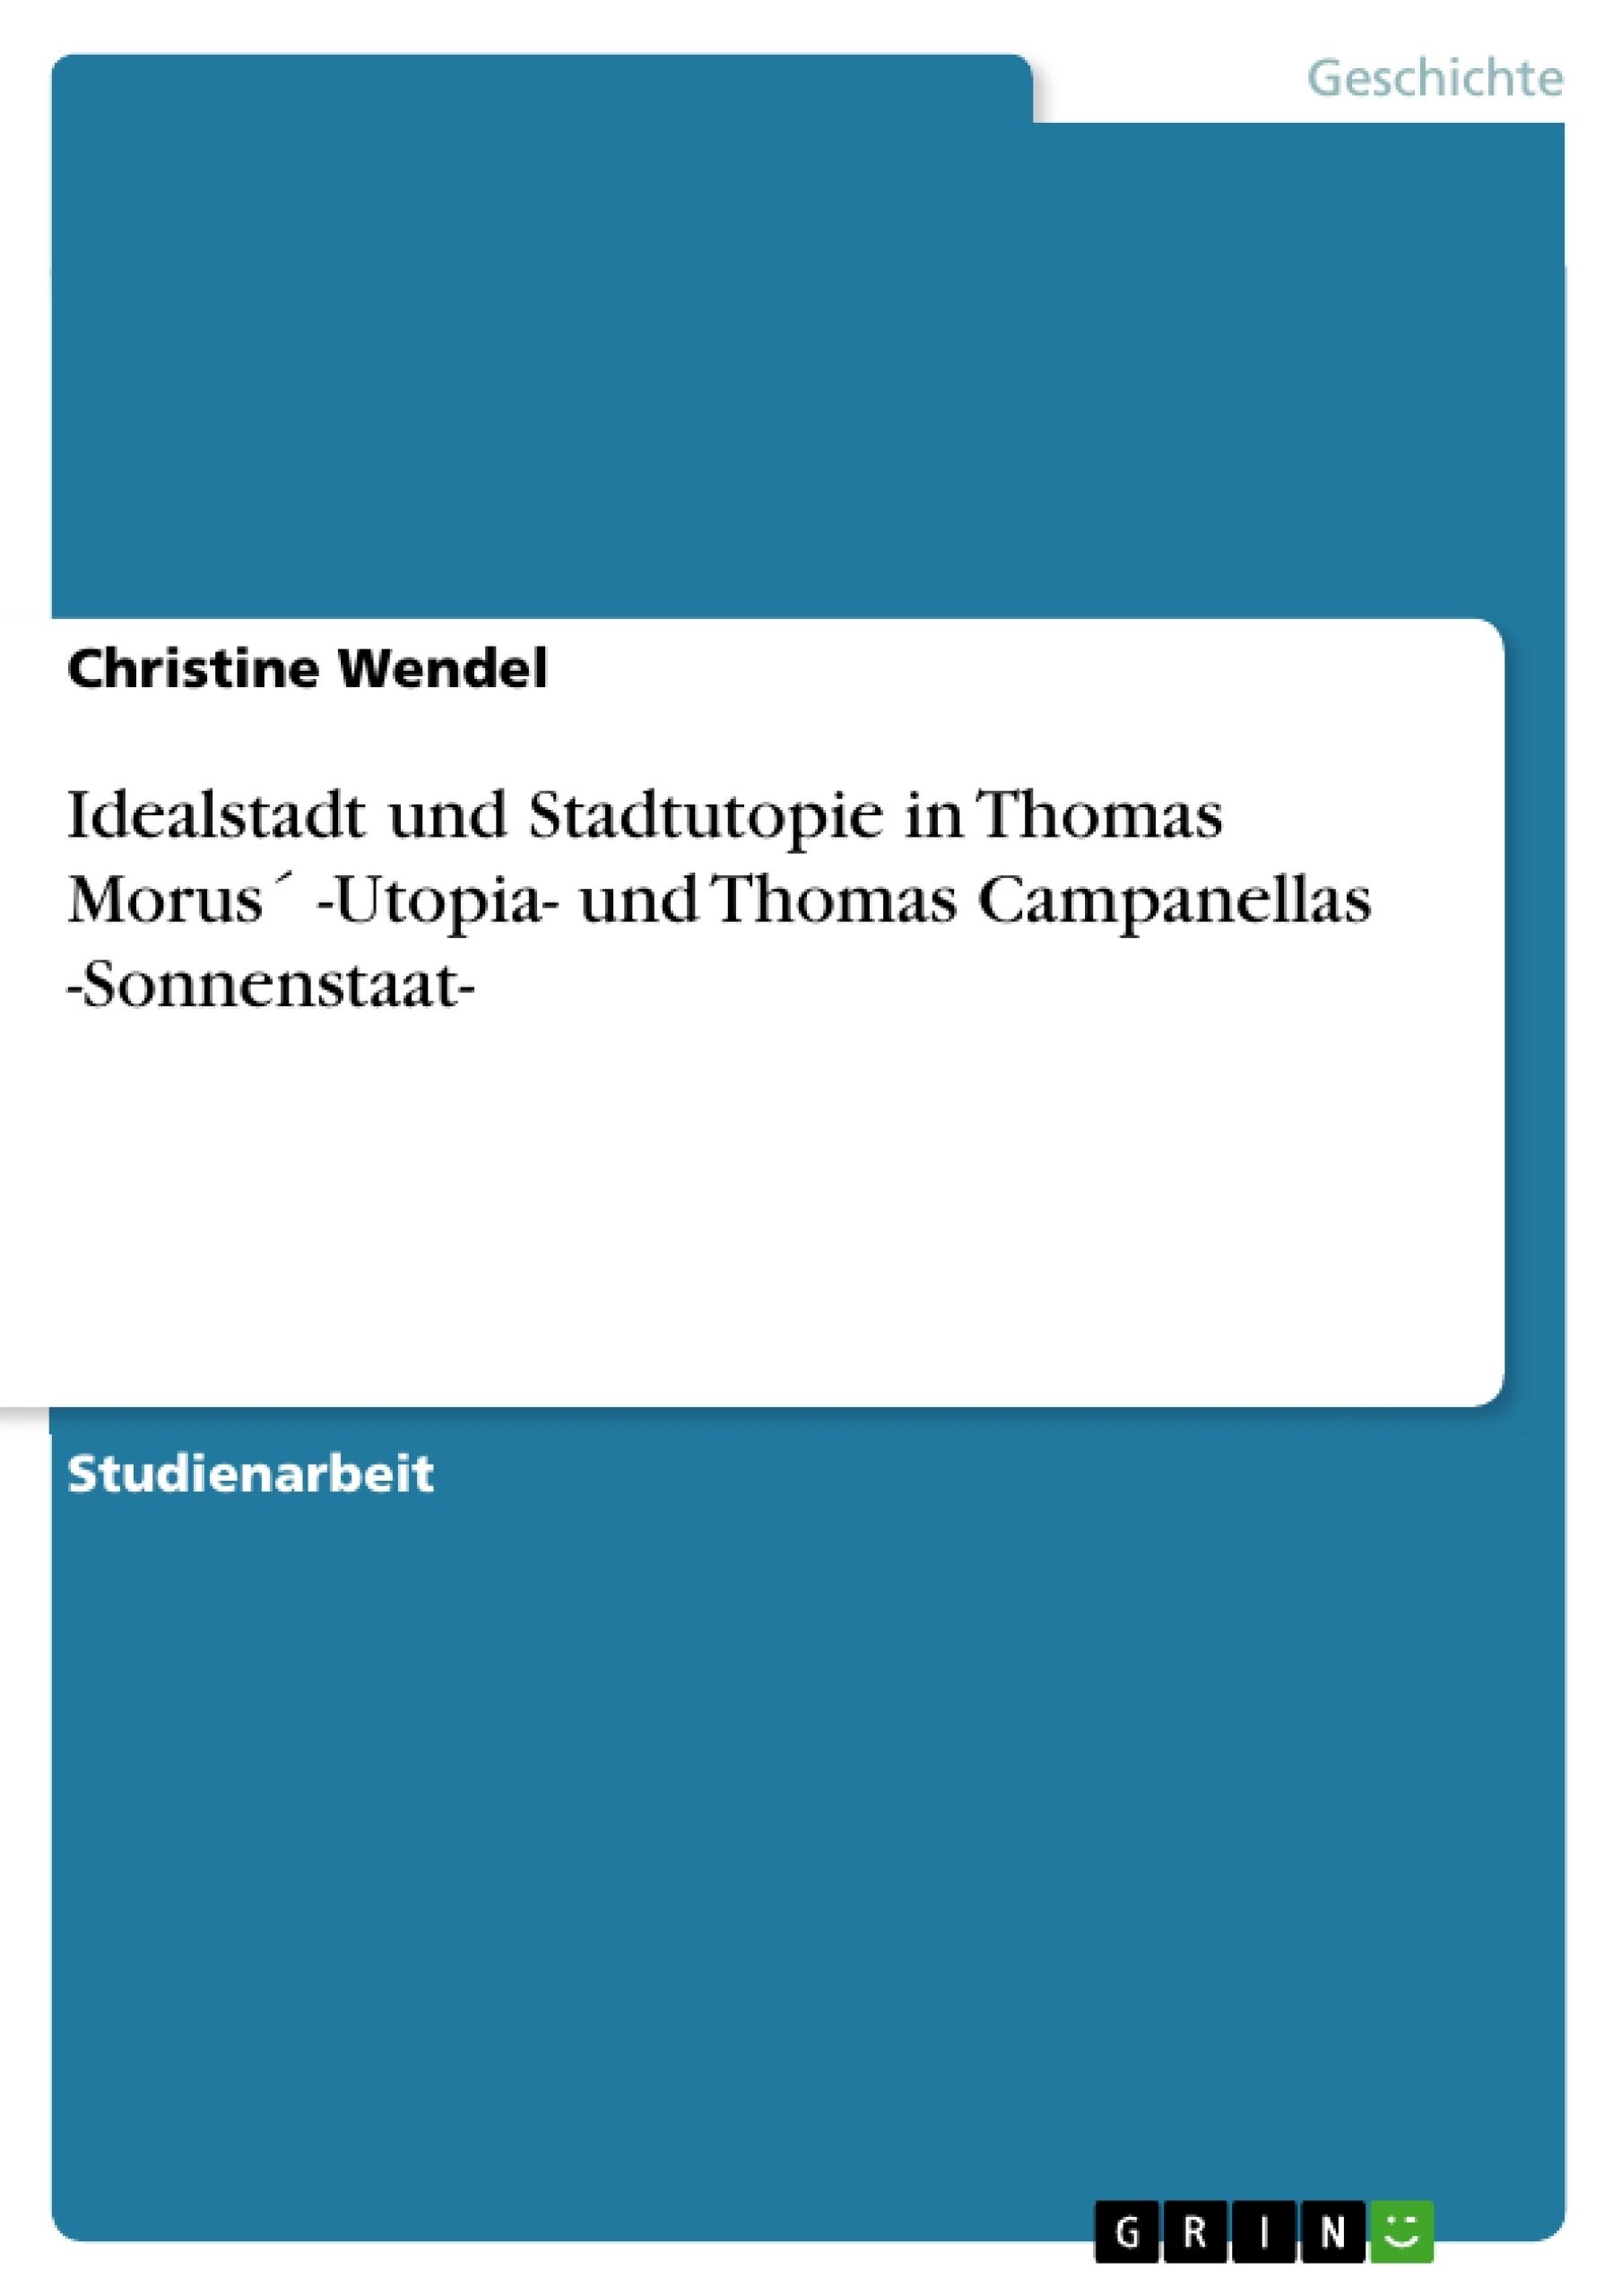 Titel: Idealstadt und Stadtutopie in Thomas Morus´ -Utopia- und Thomas Campanellas -Sonnenstaat-